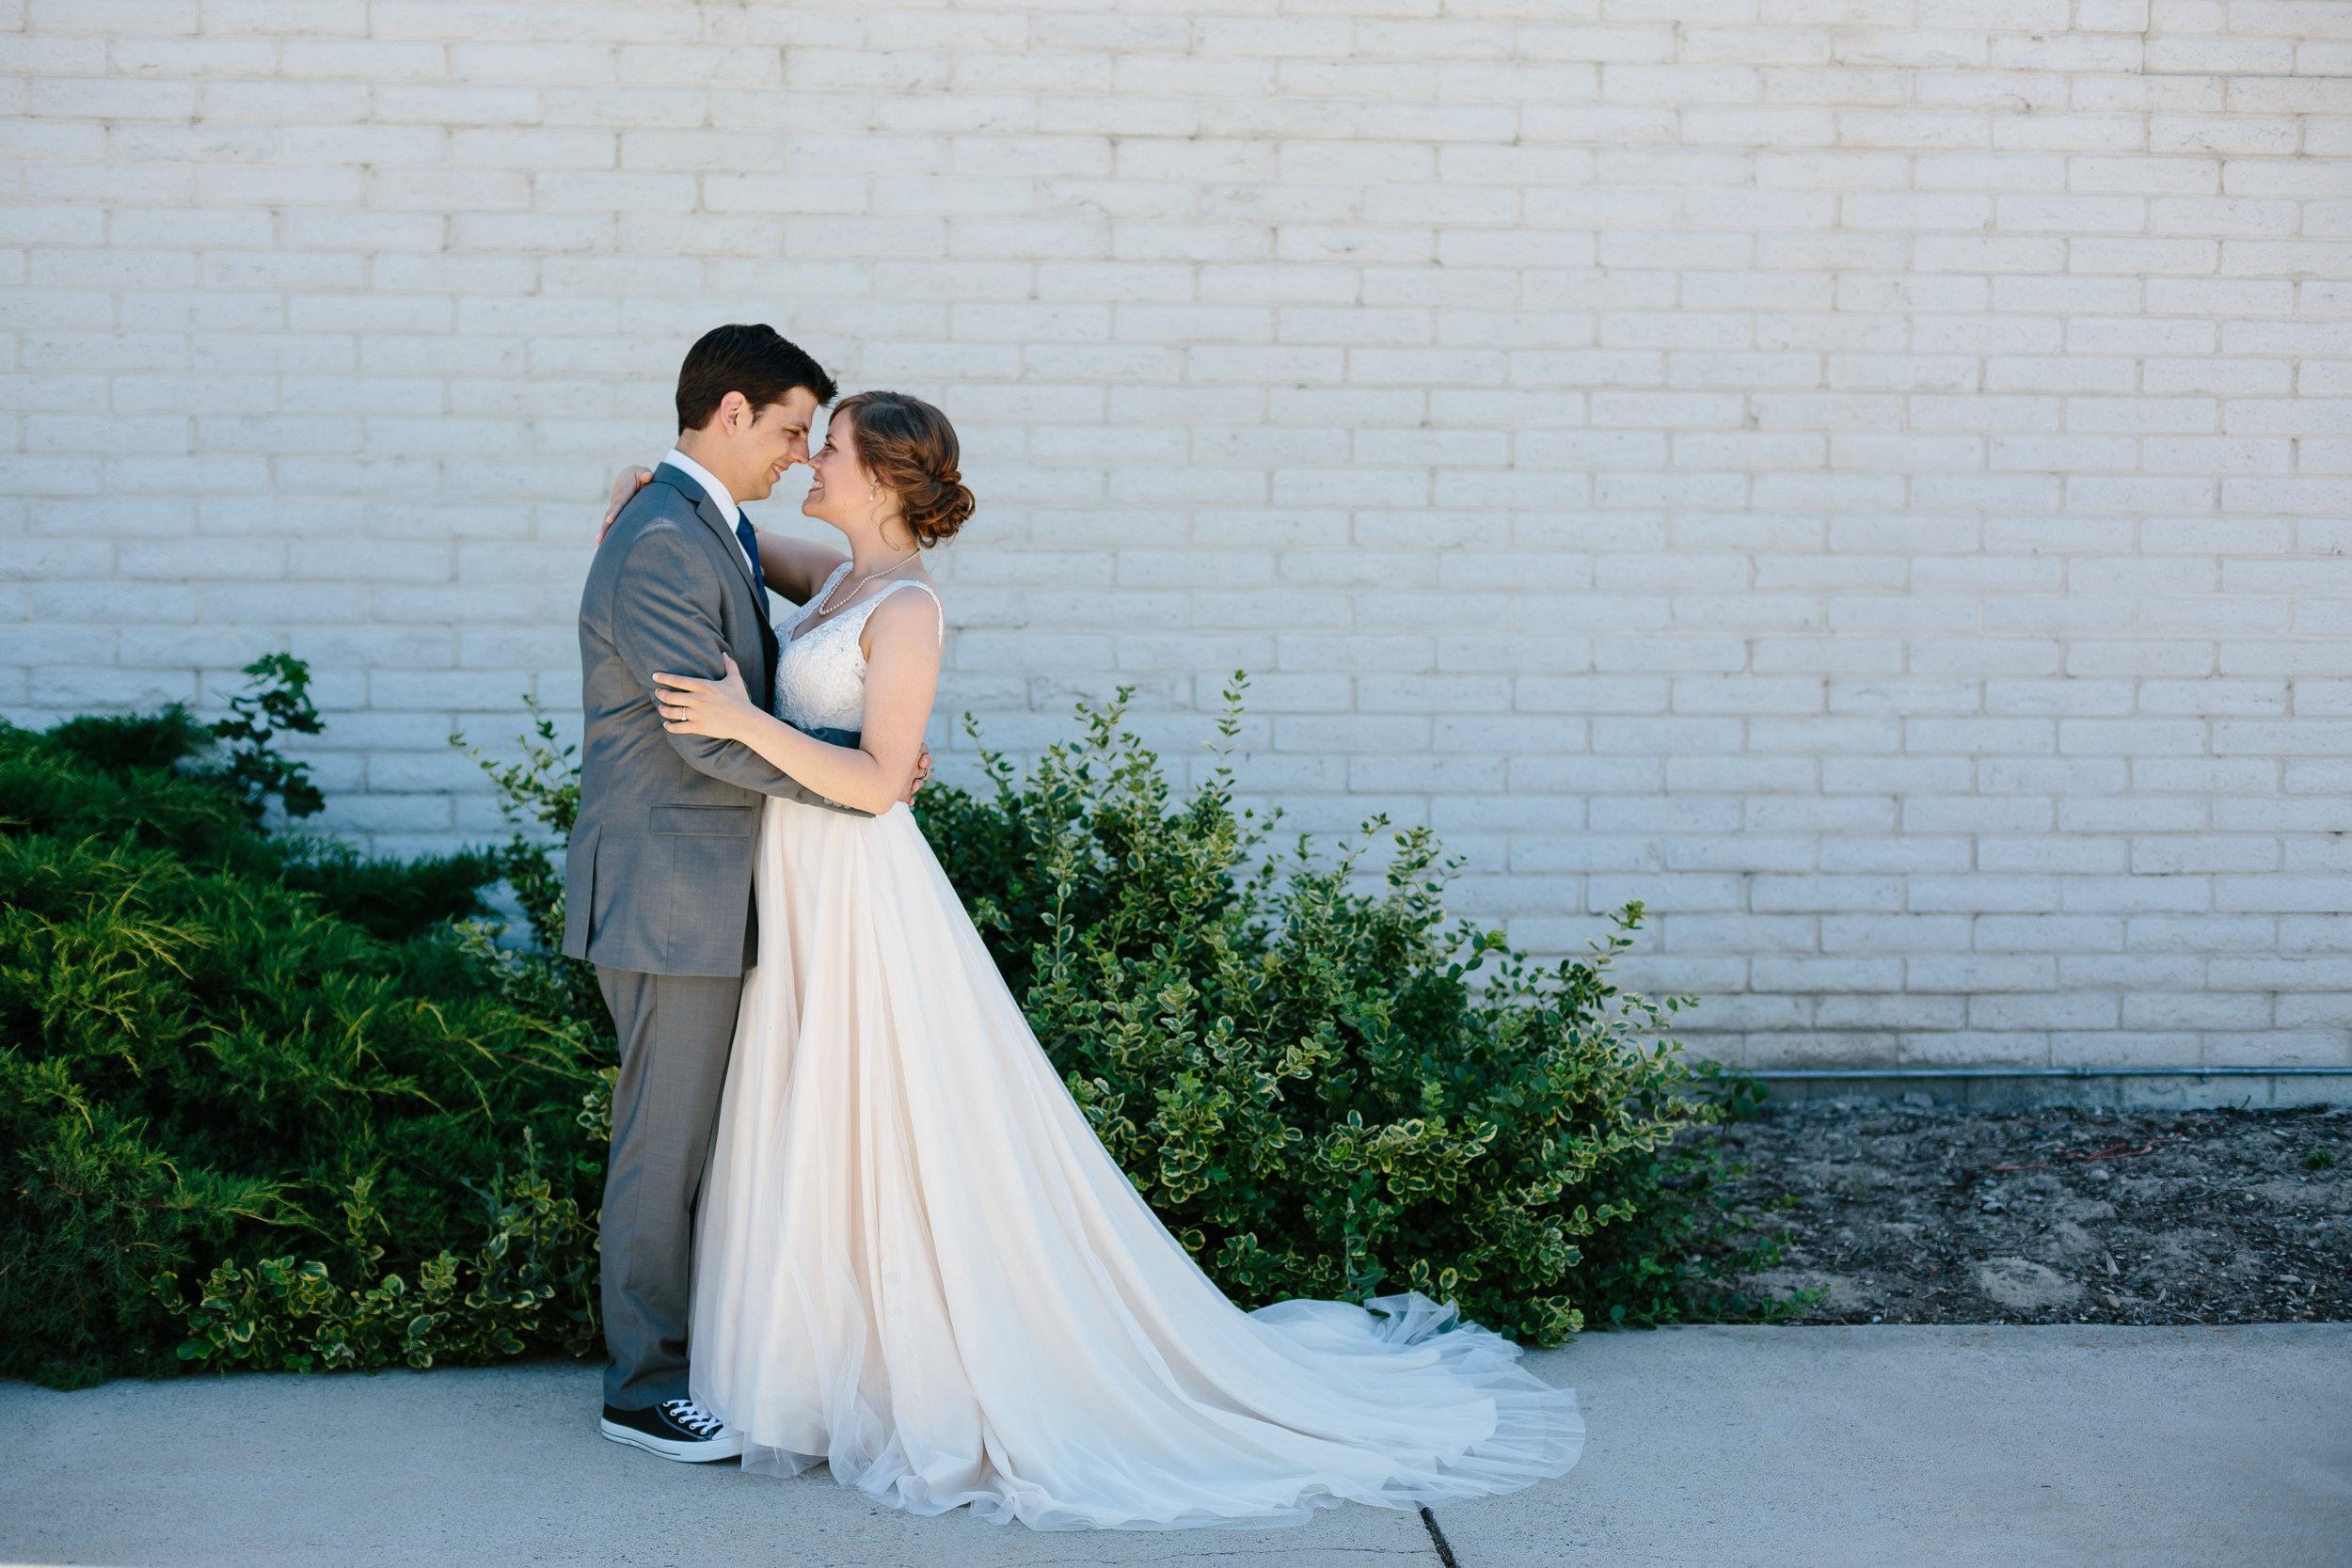 Jordan & Shantel Married - Idaho - Corrie Mick Photography-172.jpg